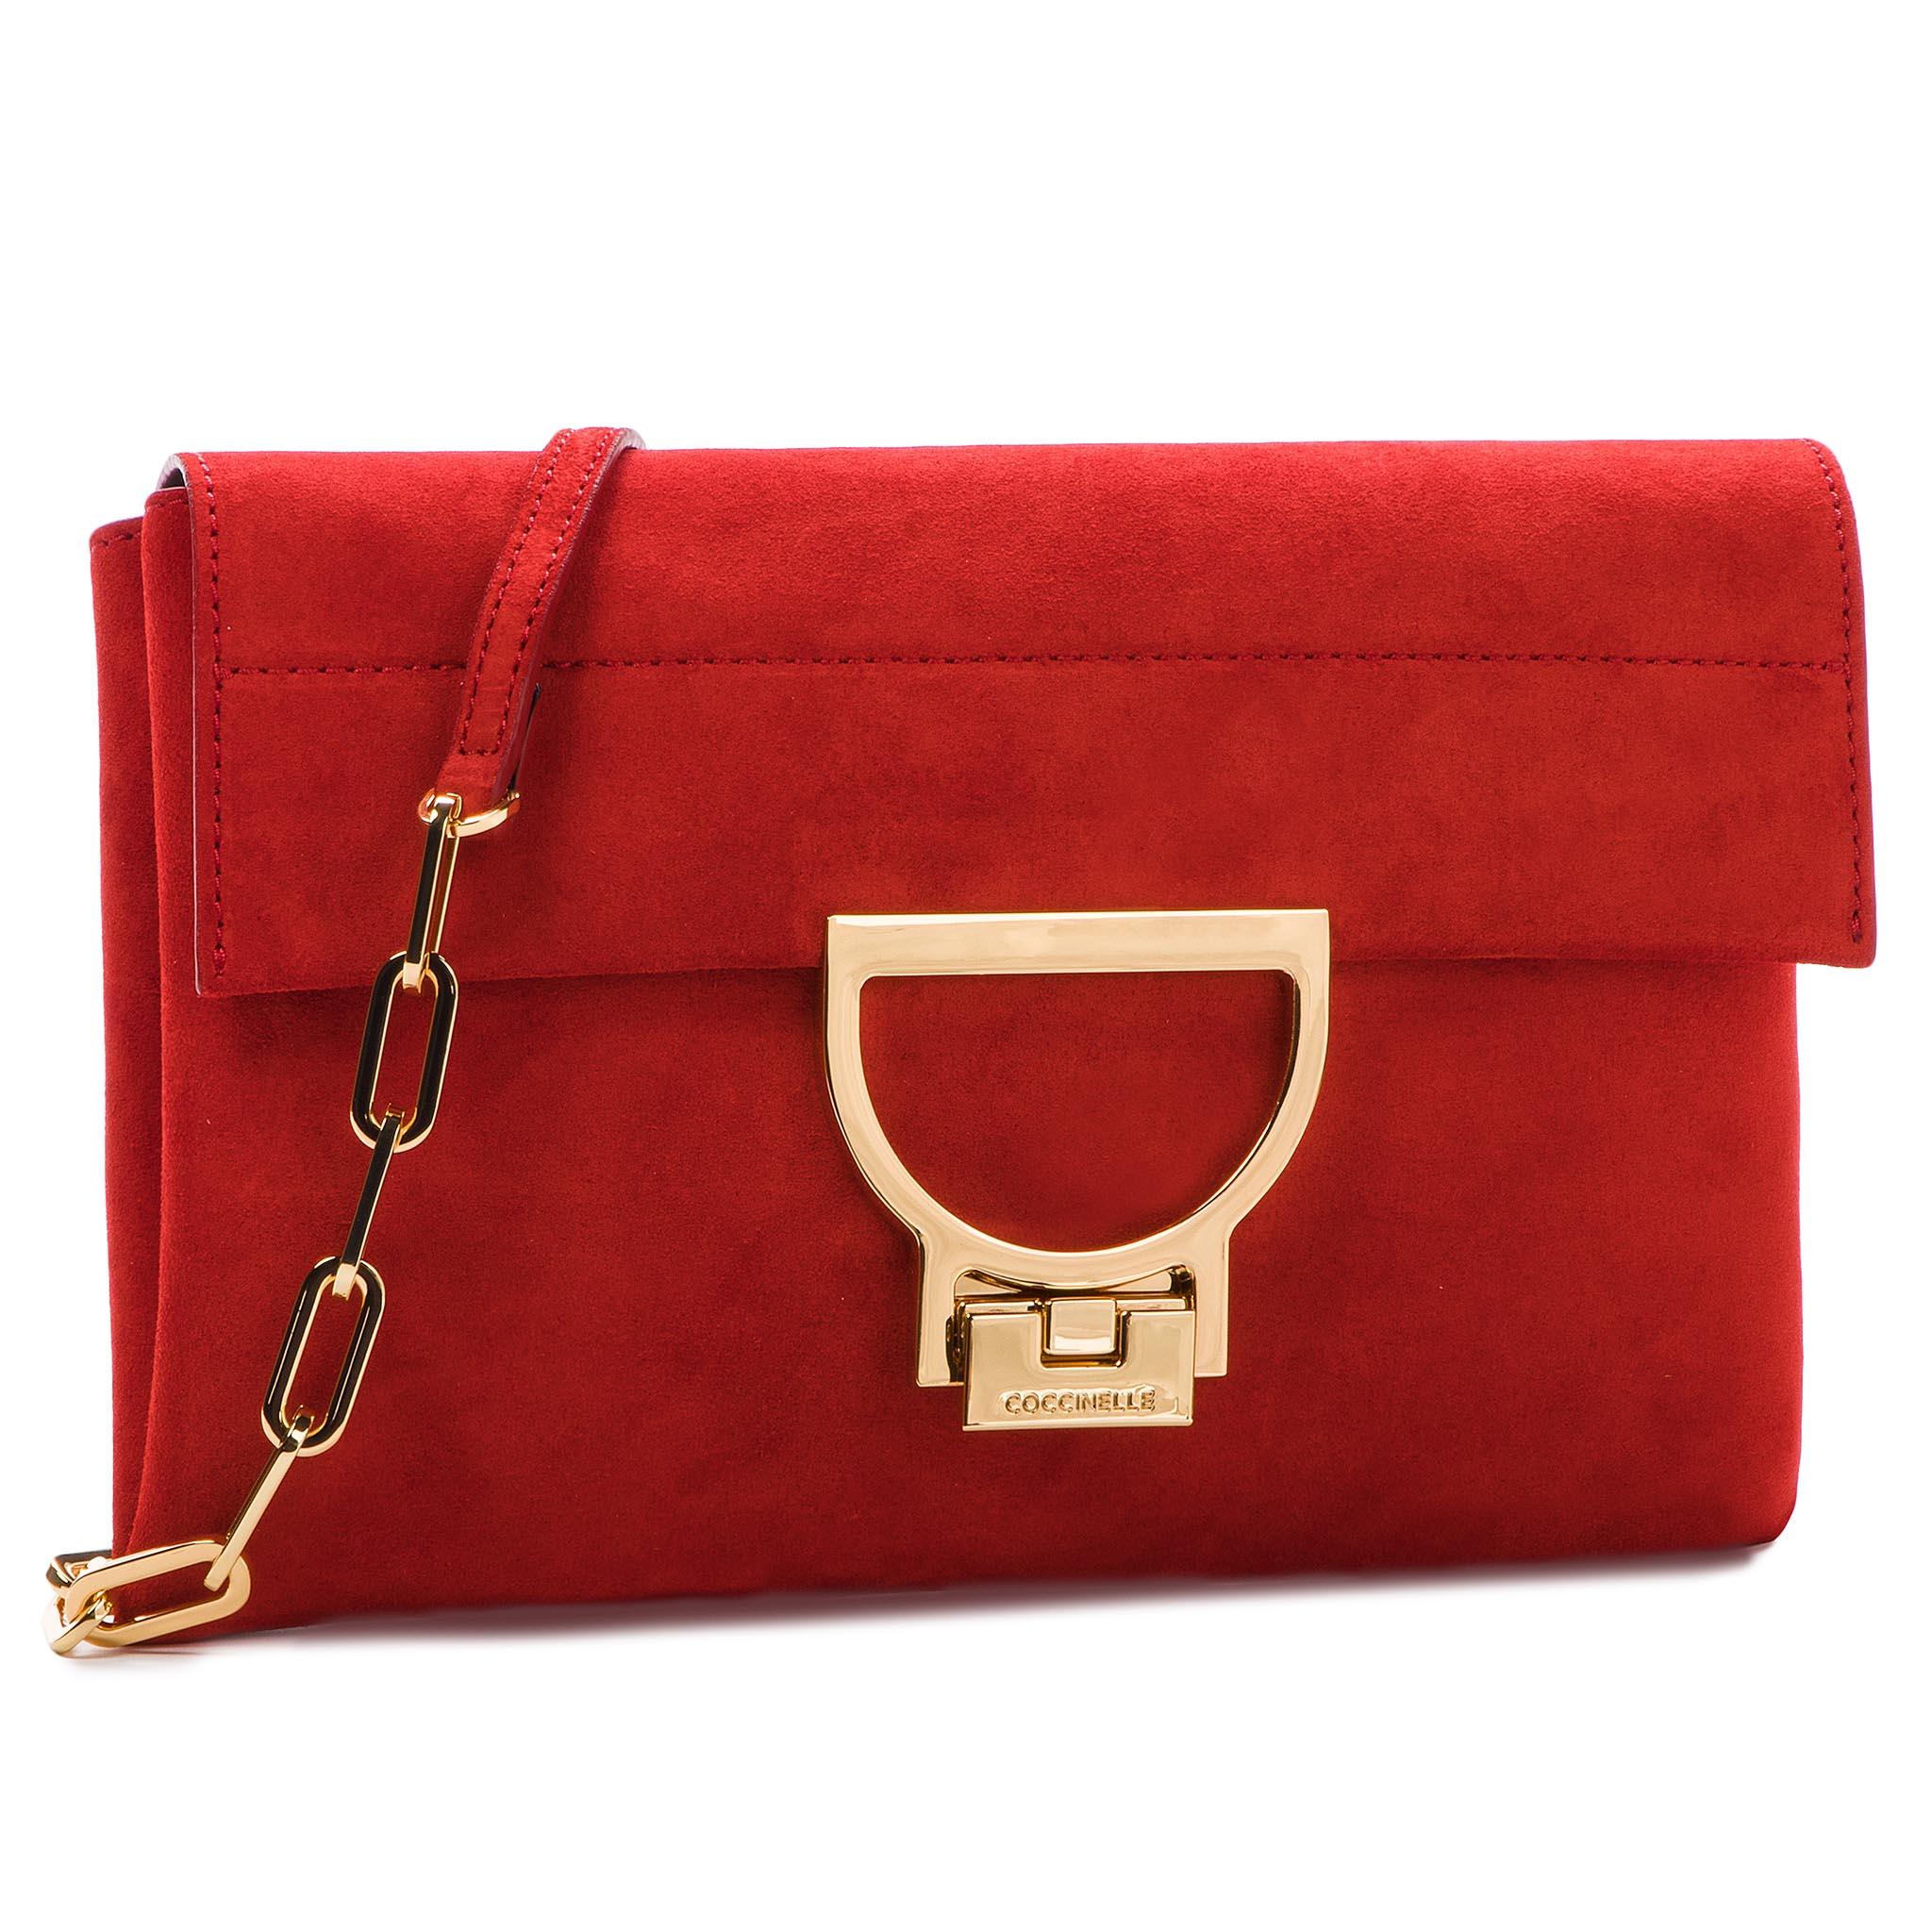 0042ac42ae Handbag COCCINELLE - CC1 Essentielle Suede E1 CC1 15 02 01 Ebano W00 ...